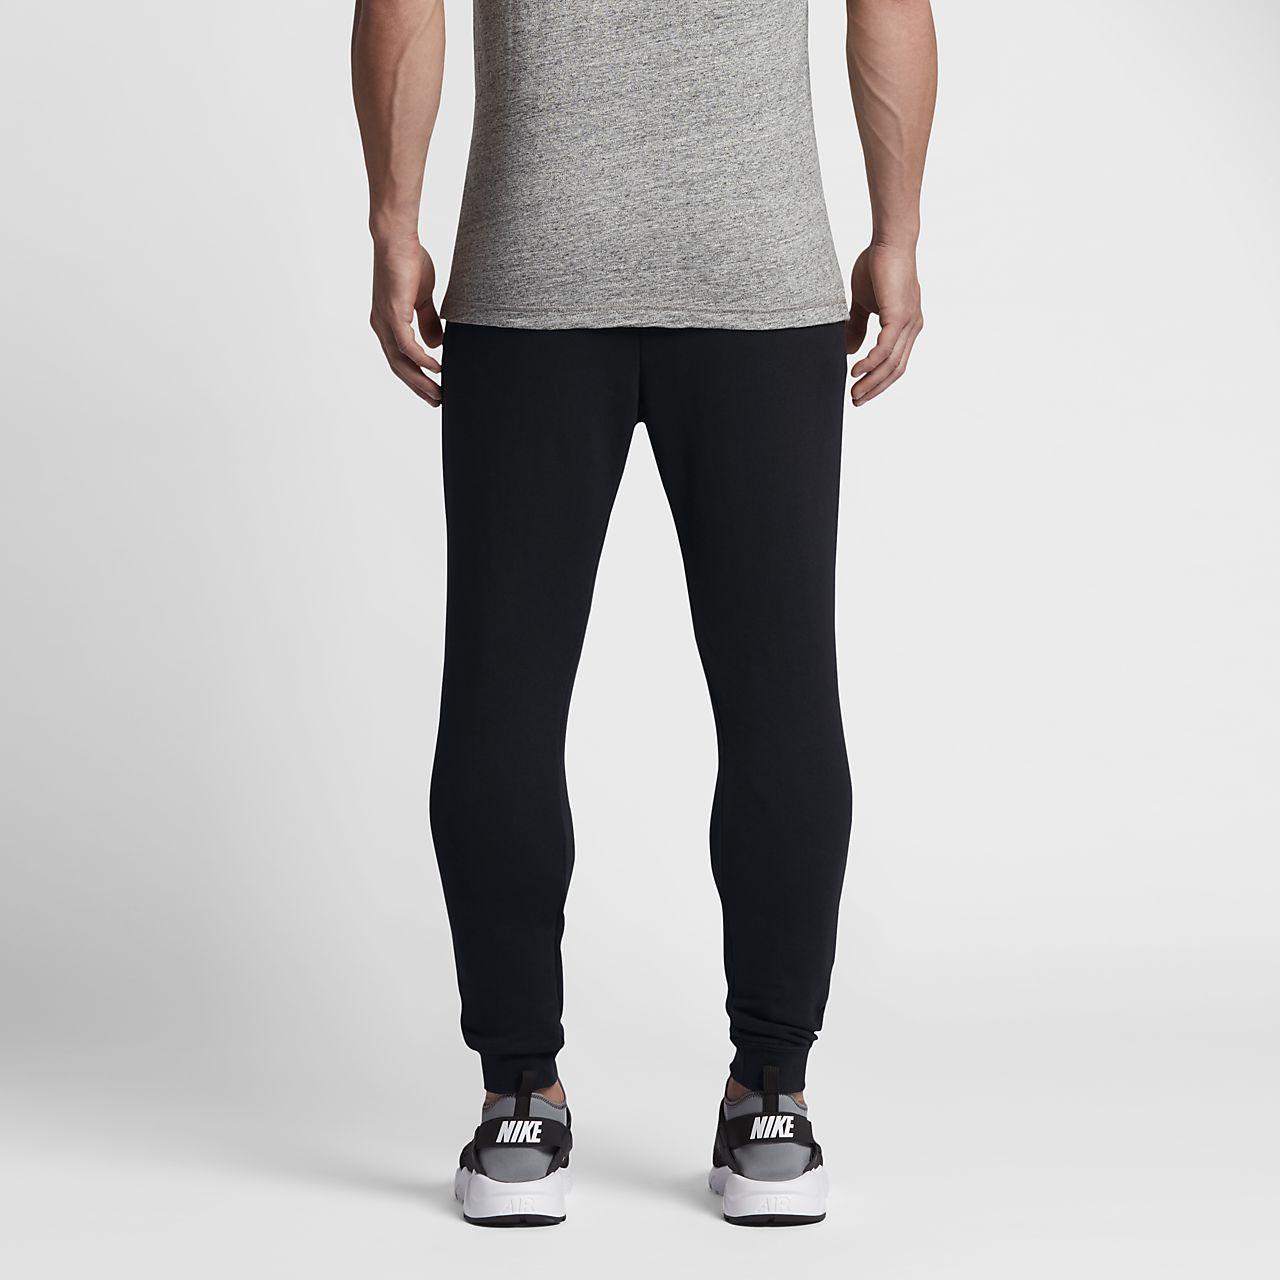 jogger nike uomo